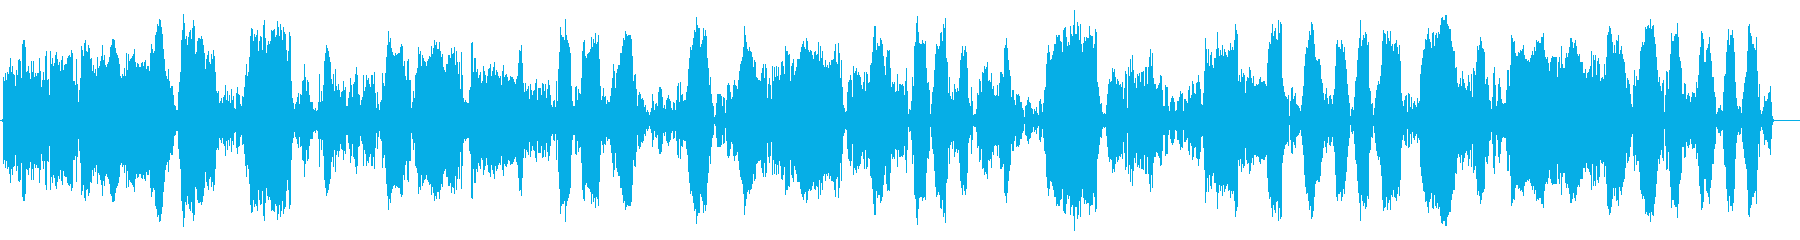 xxx… (奇怪な人形の声)の再生済みの波形